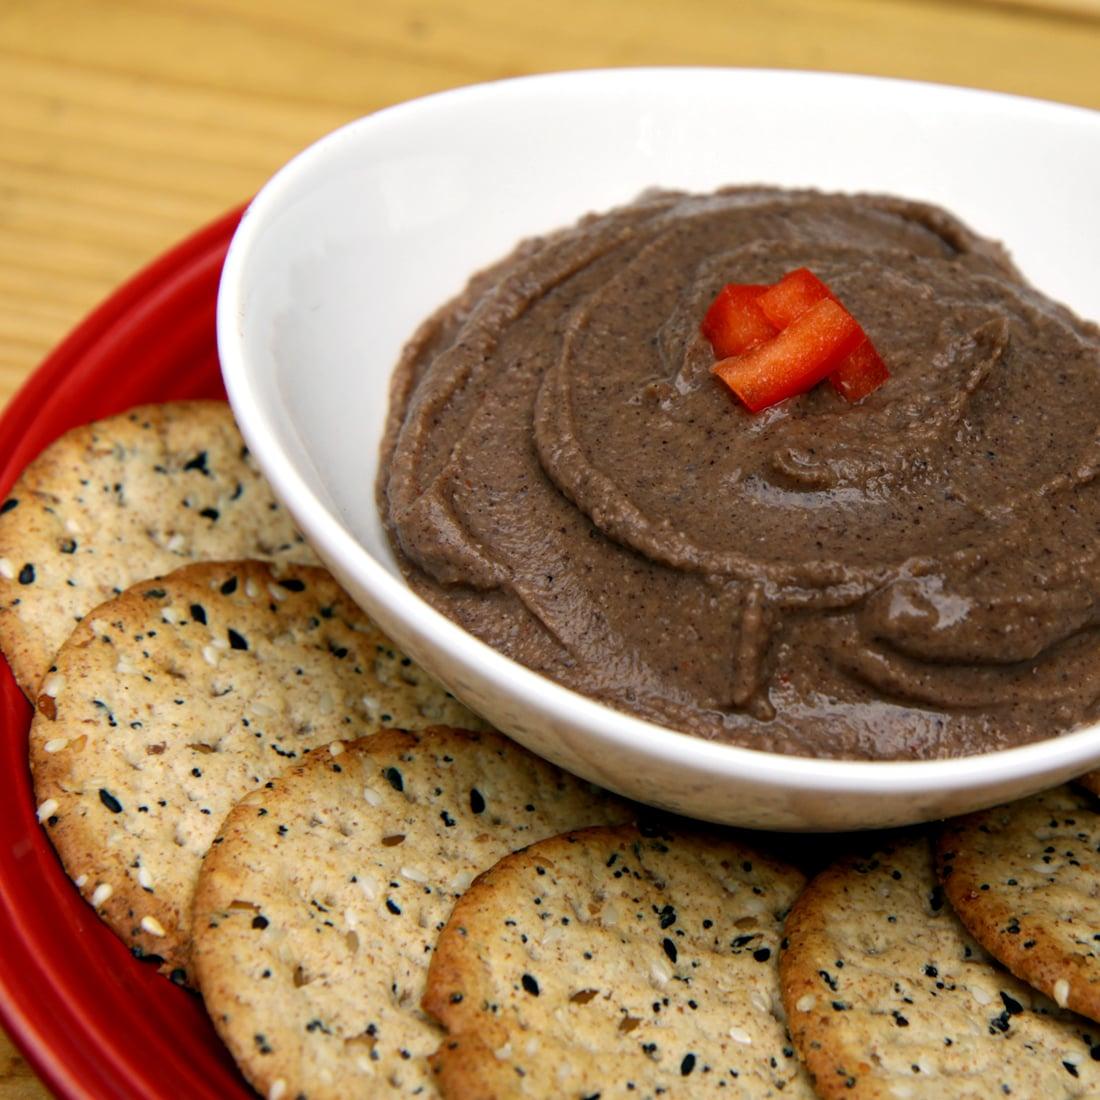 Spicy Black Bean Hummus